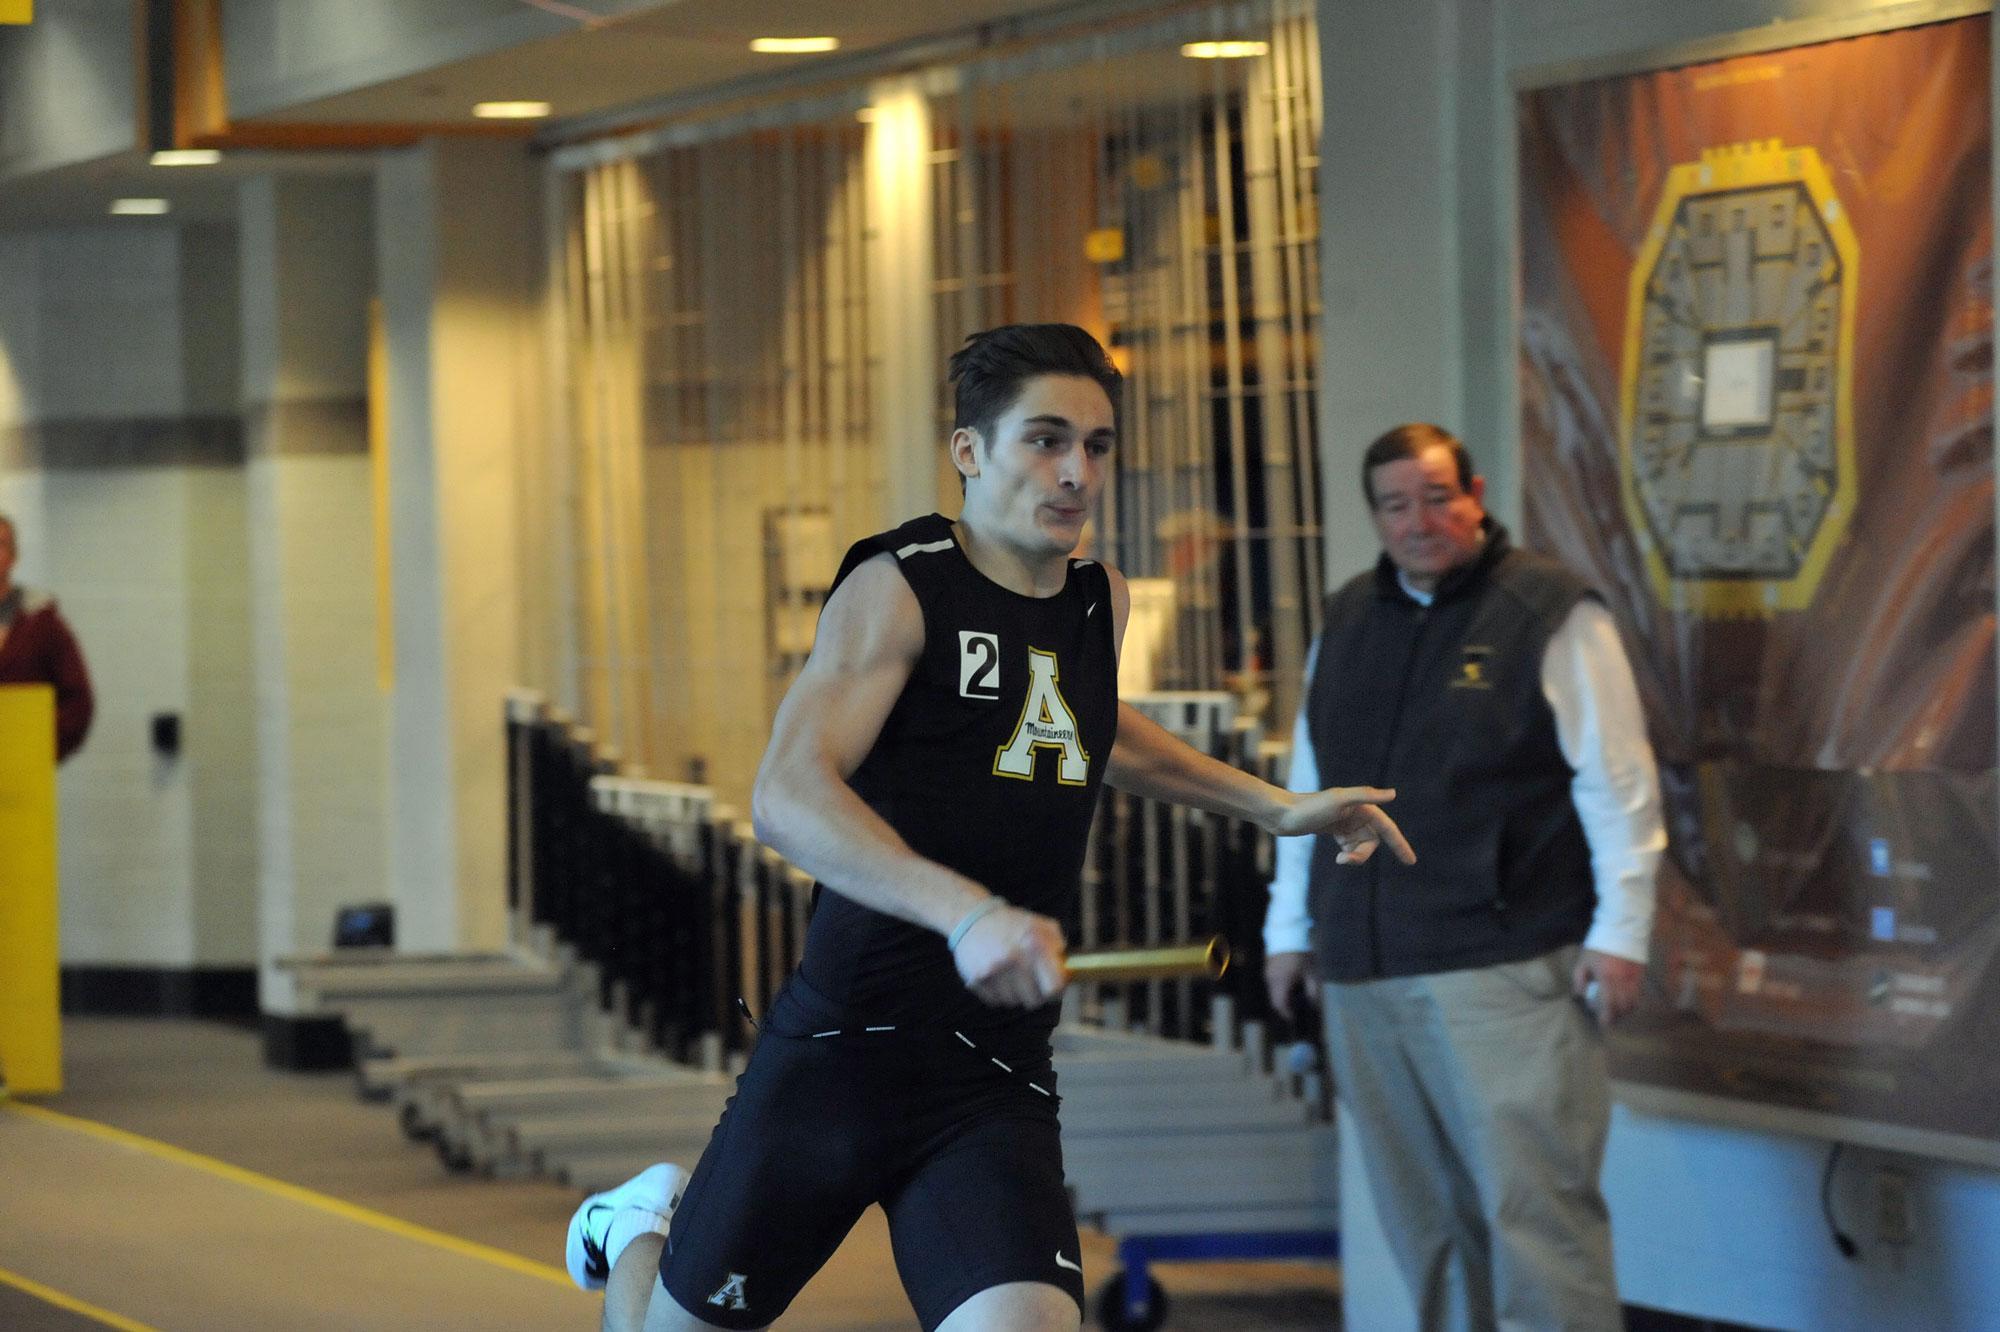 Andrew Spear. Photo courtesy Dave Mayo/App State Athletics.